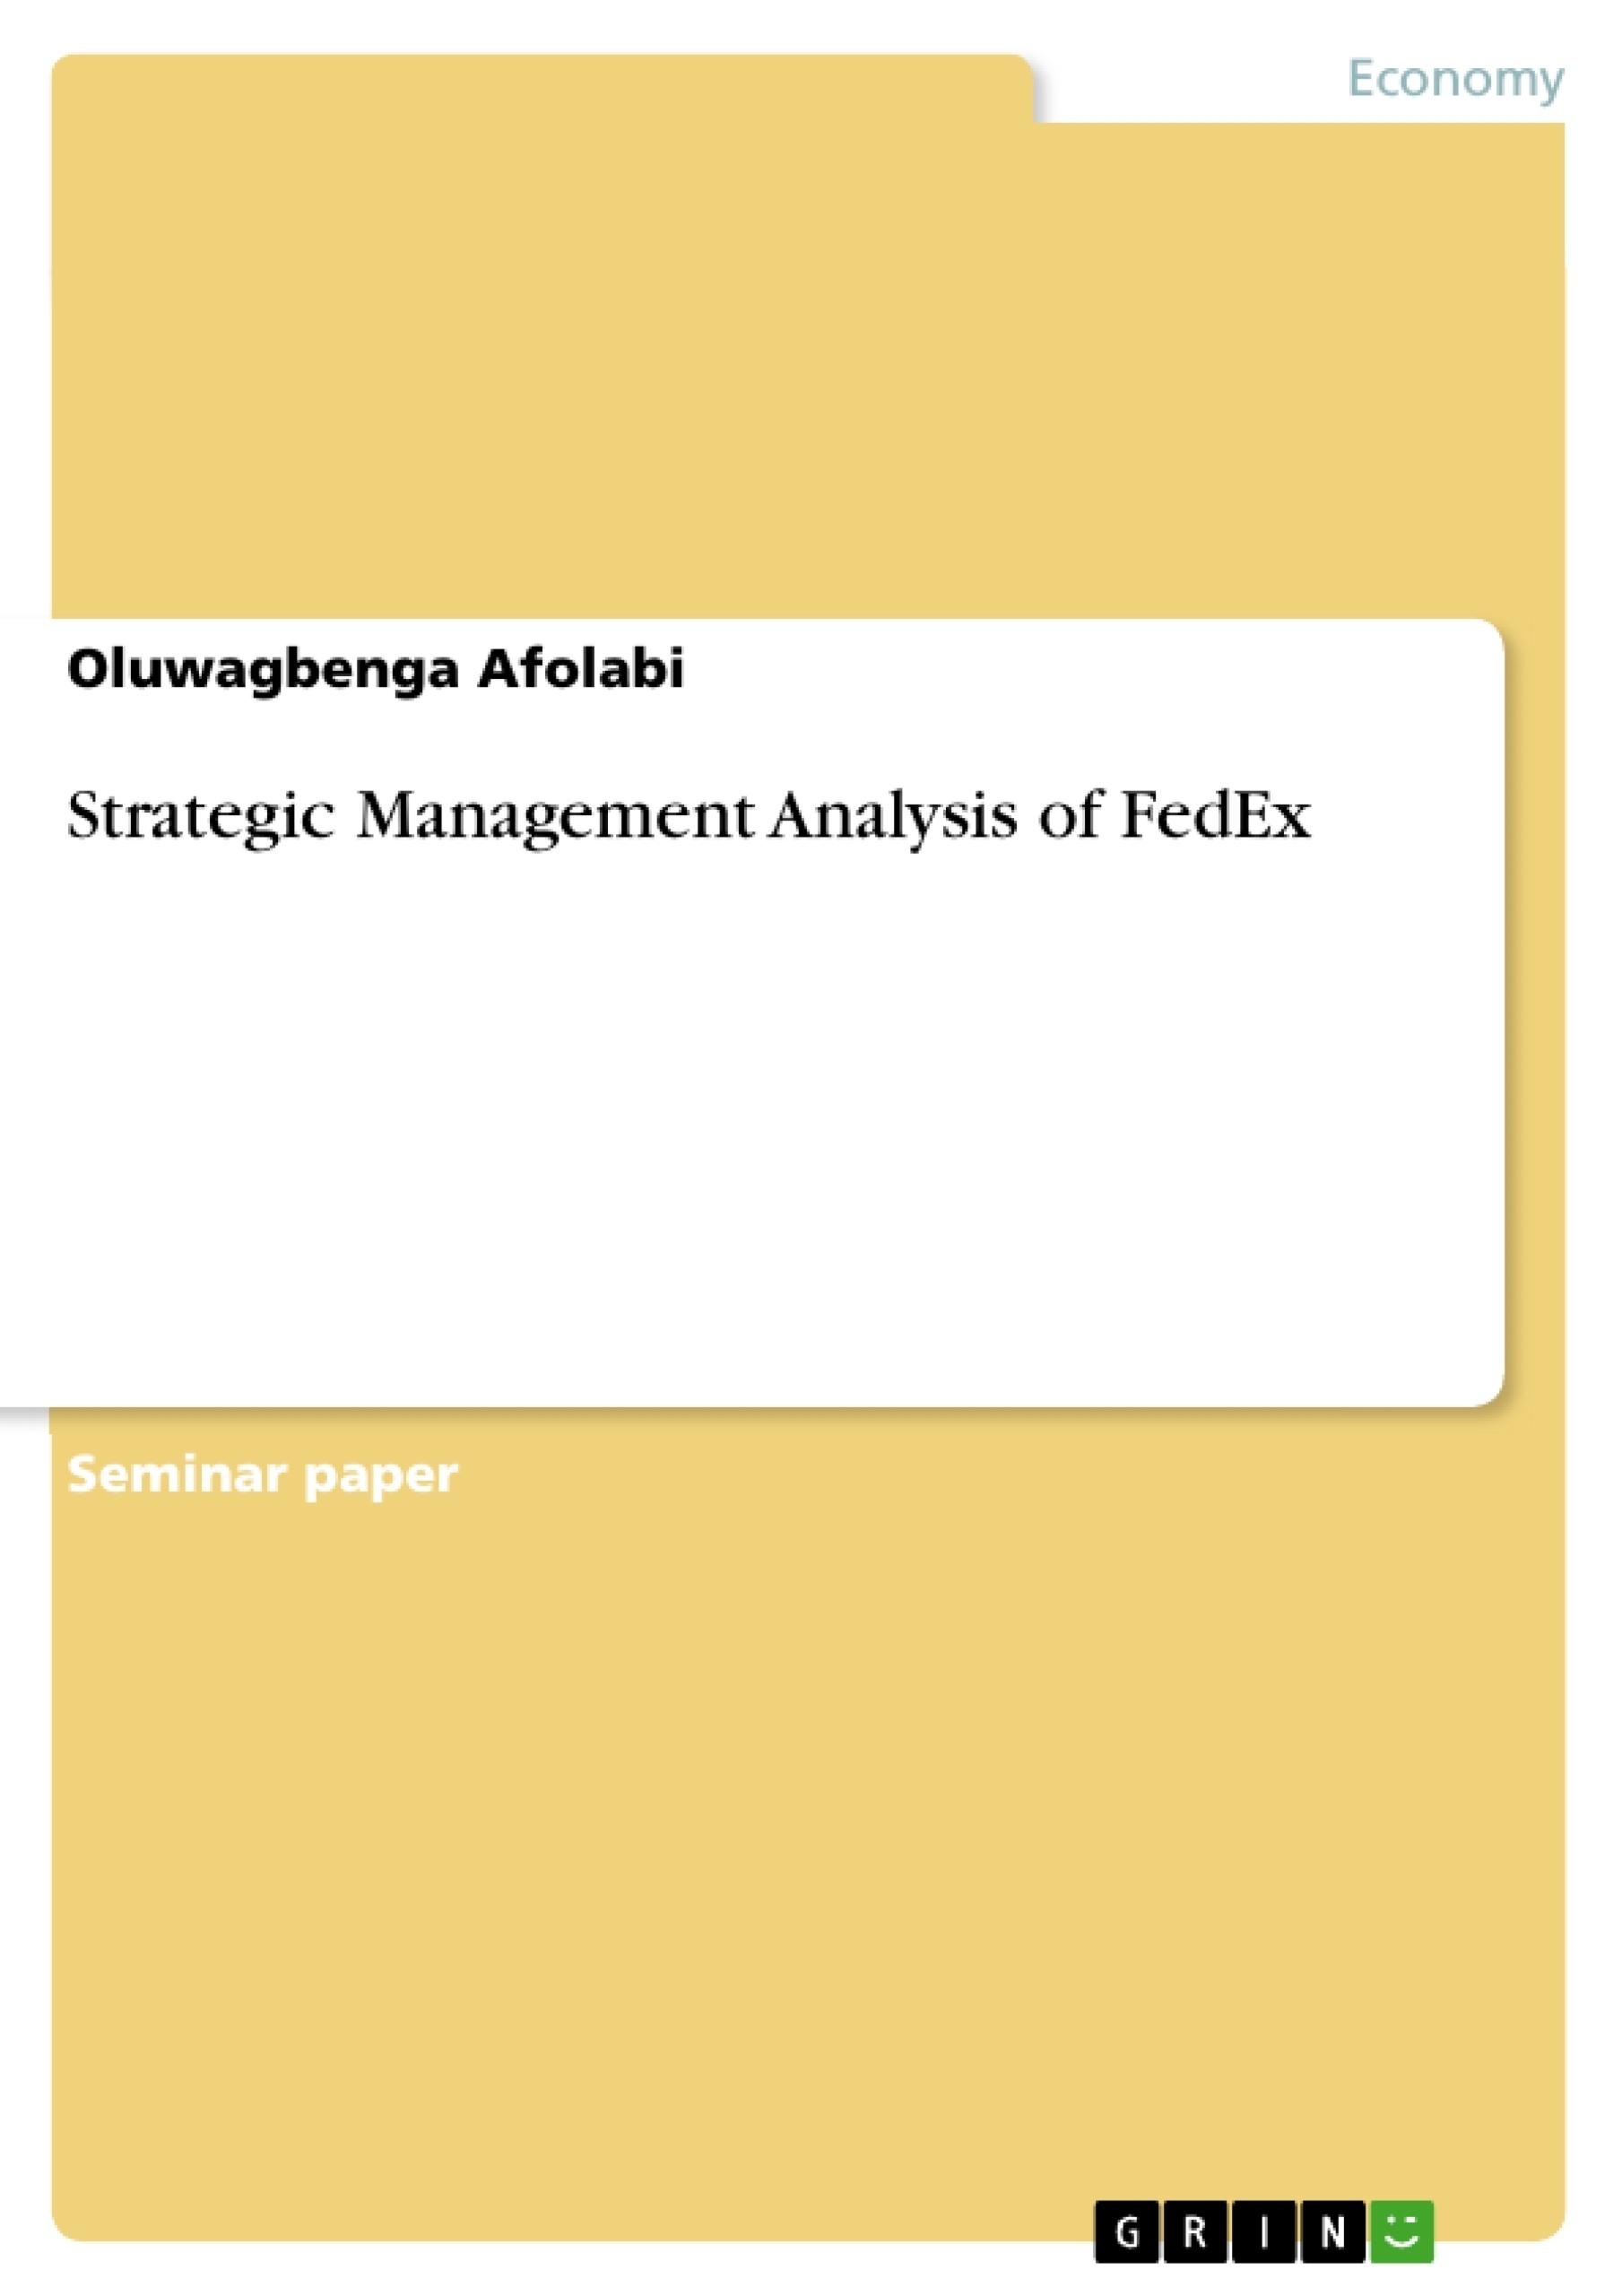 Title: Strategic Management Analysis of FedEx